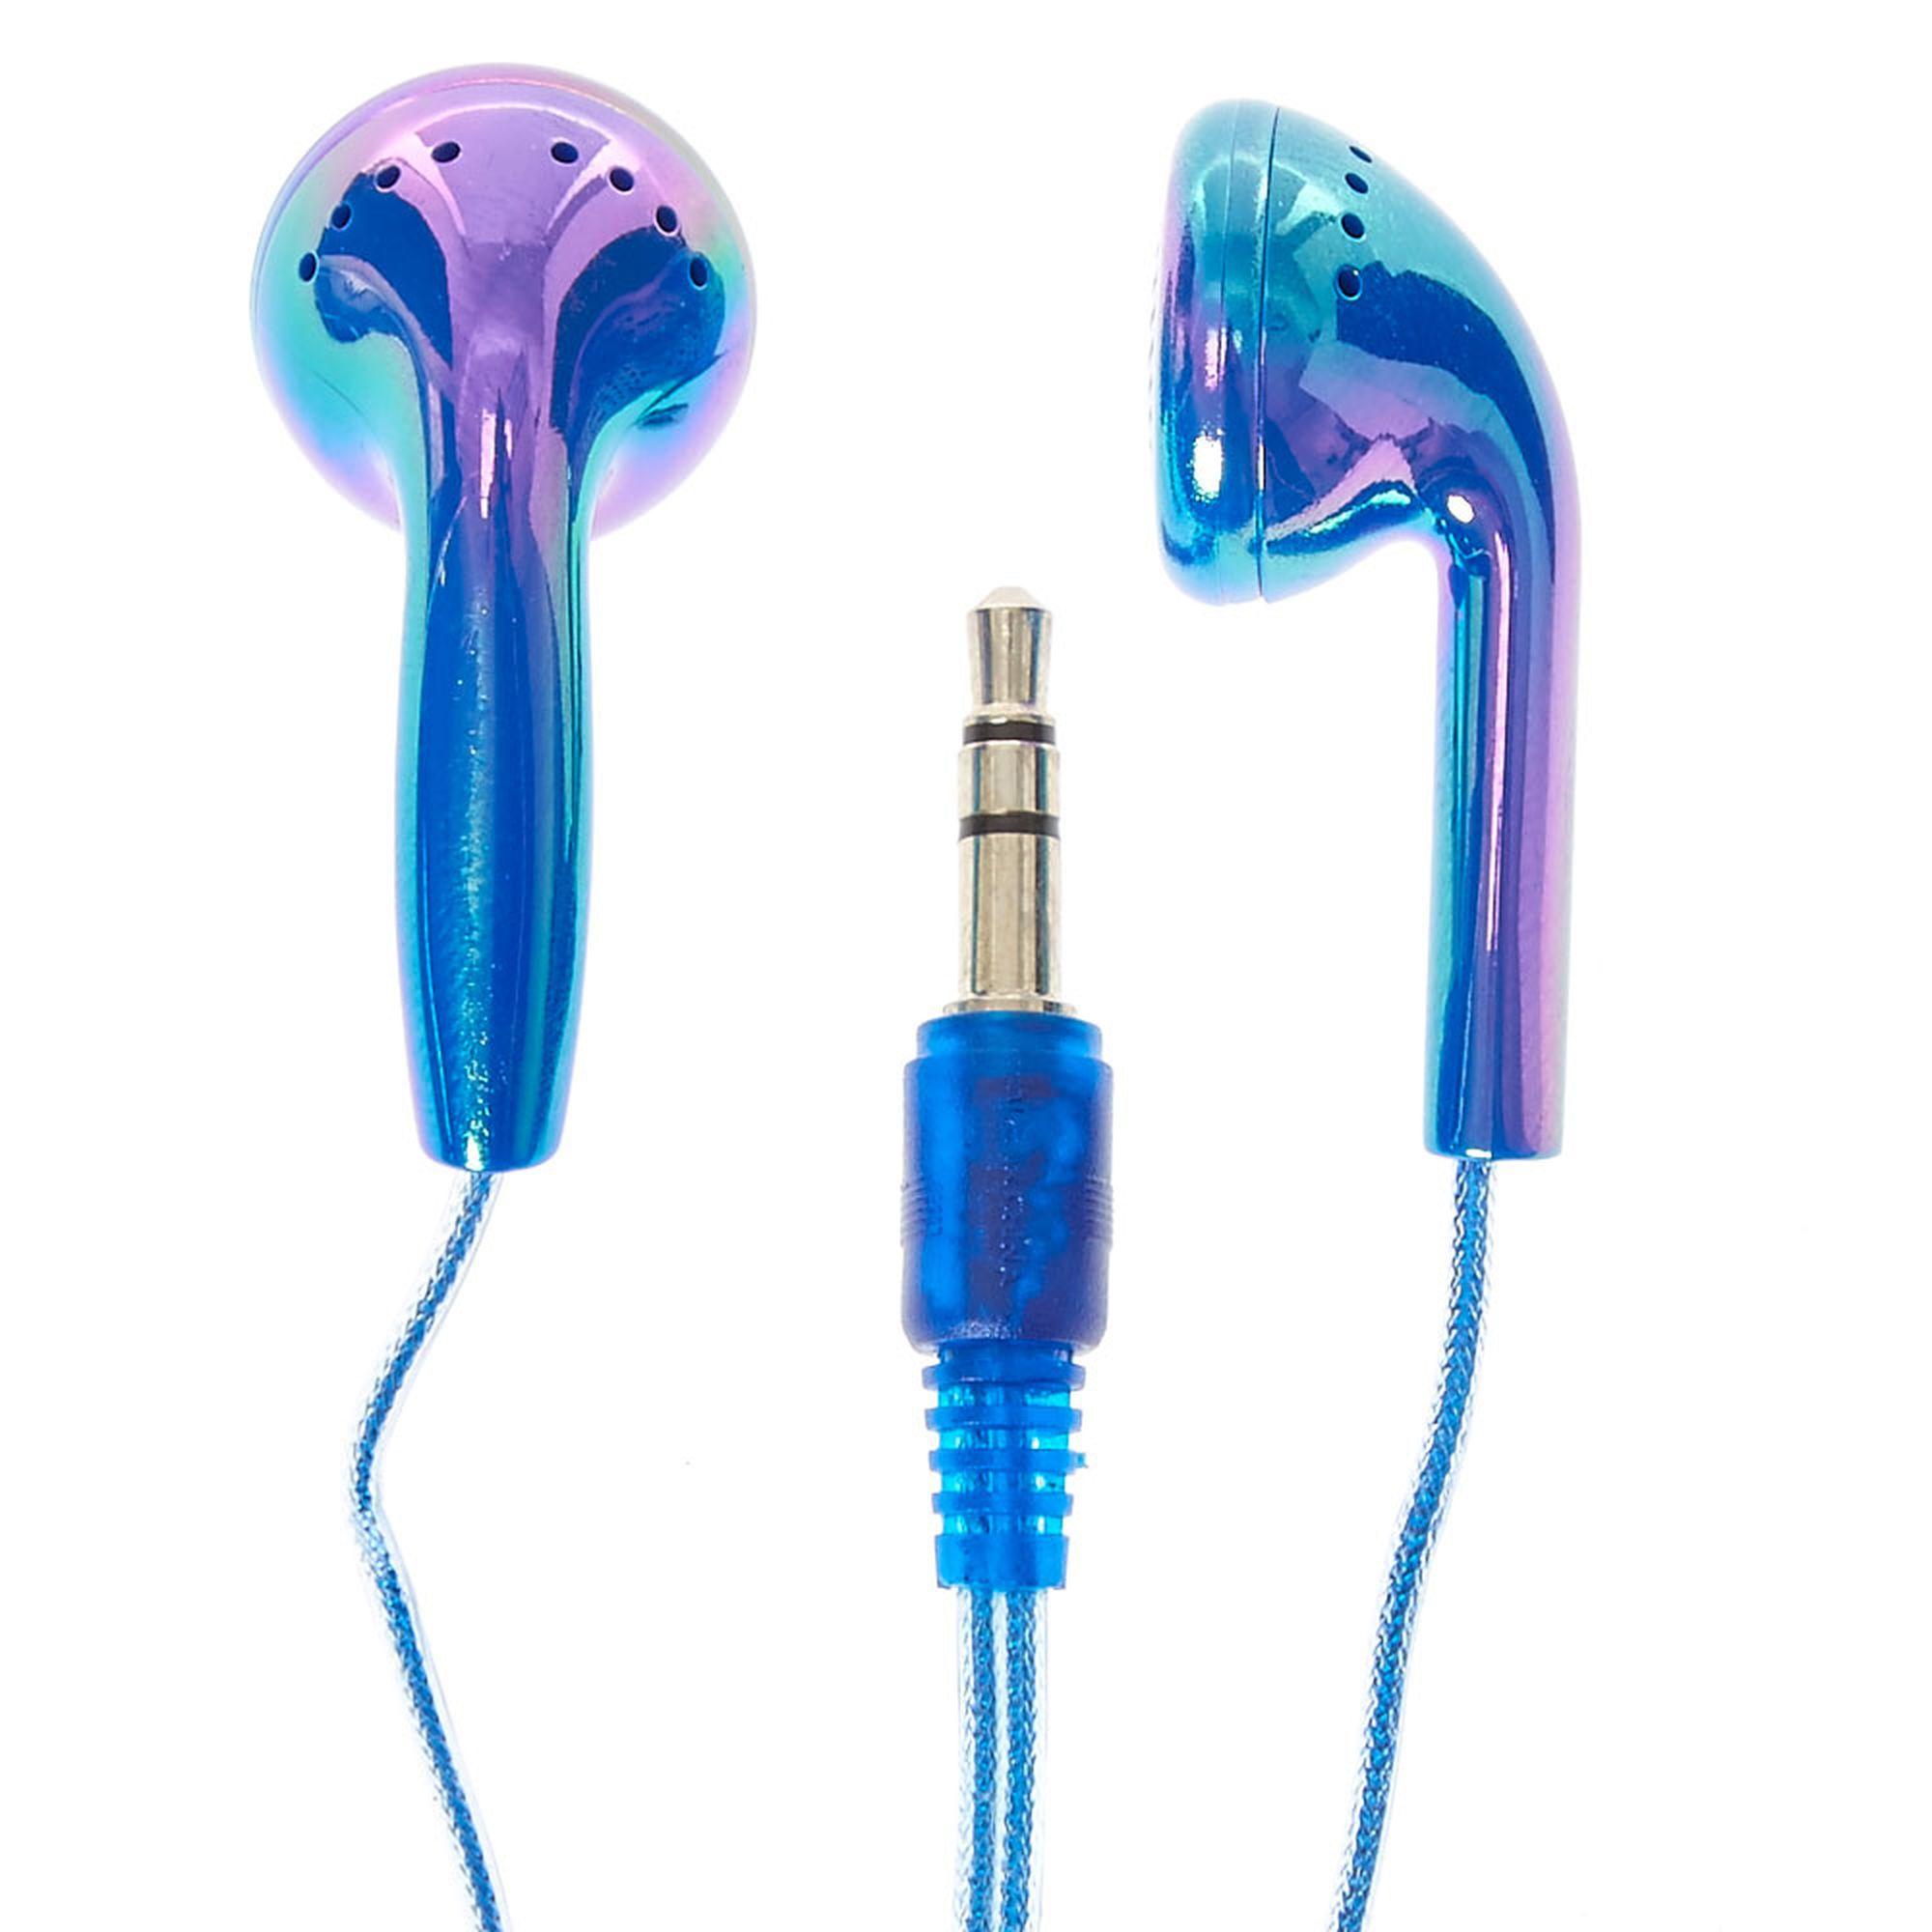 Mermaid gifts: Mermaid earbuds | Claire's